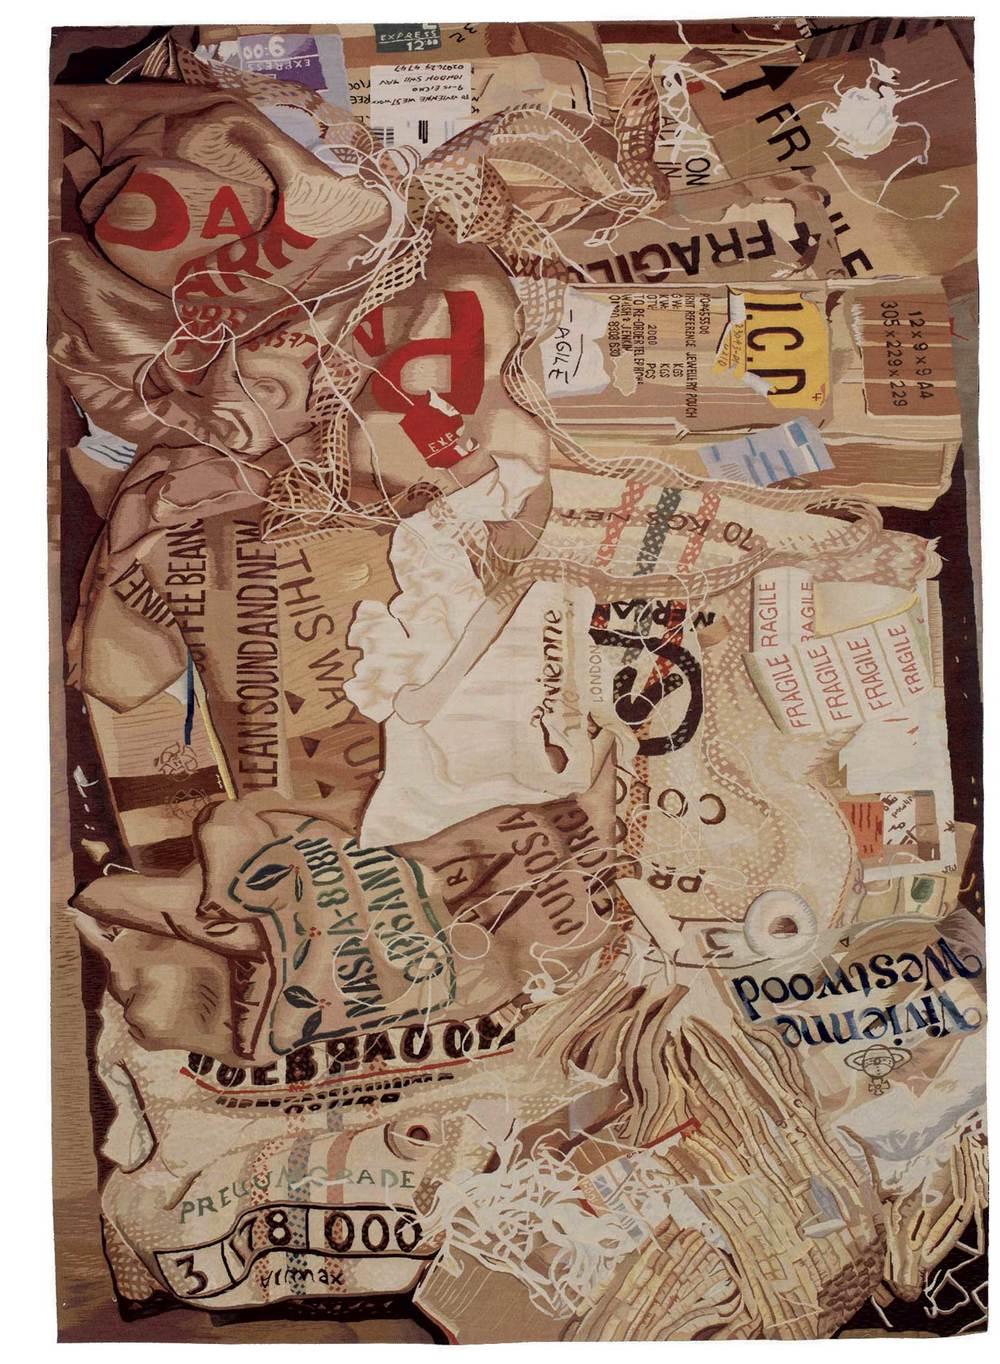 Rubbish by Vivienne Westwood